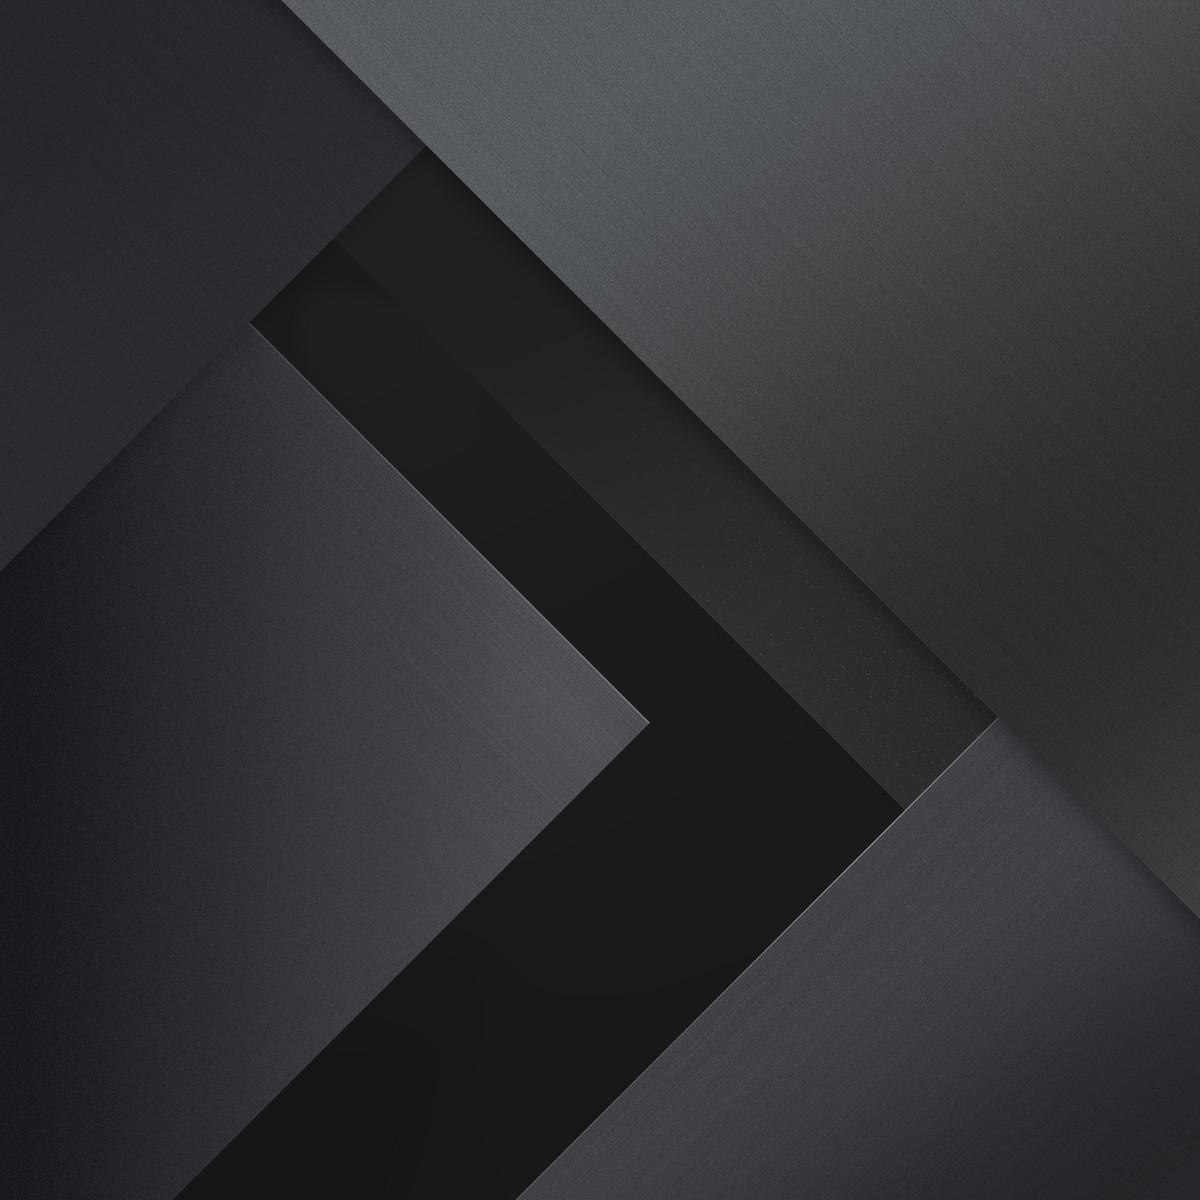 Galaxy-S7-wallpaper-2